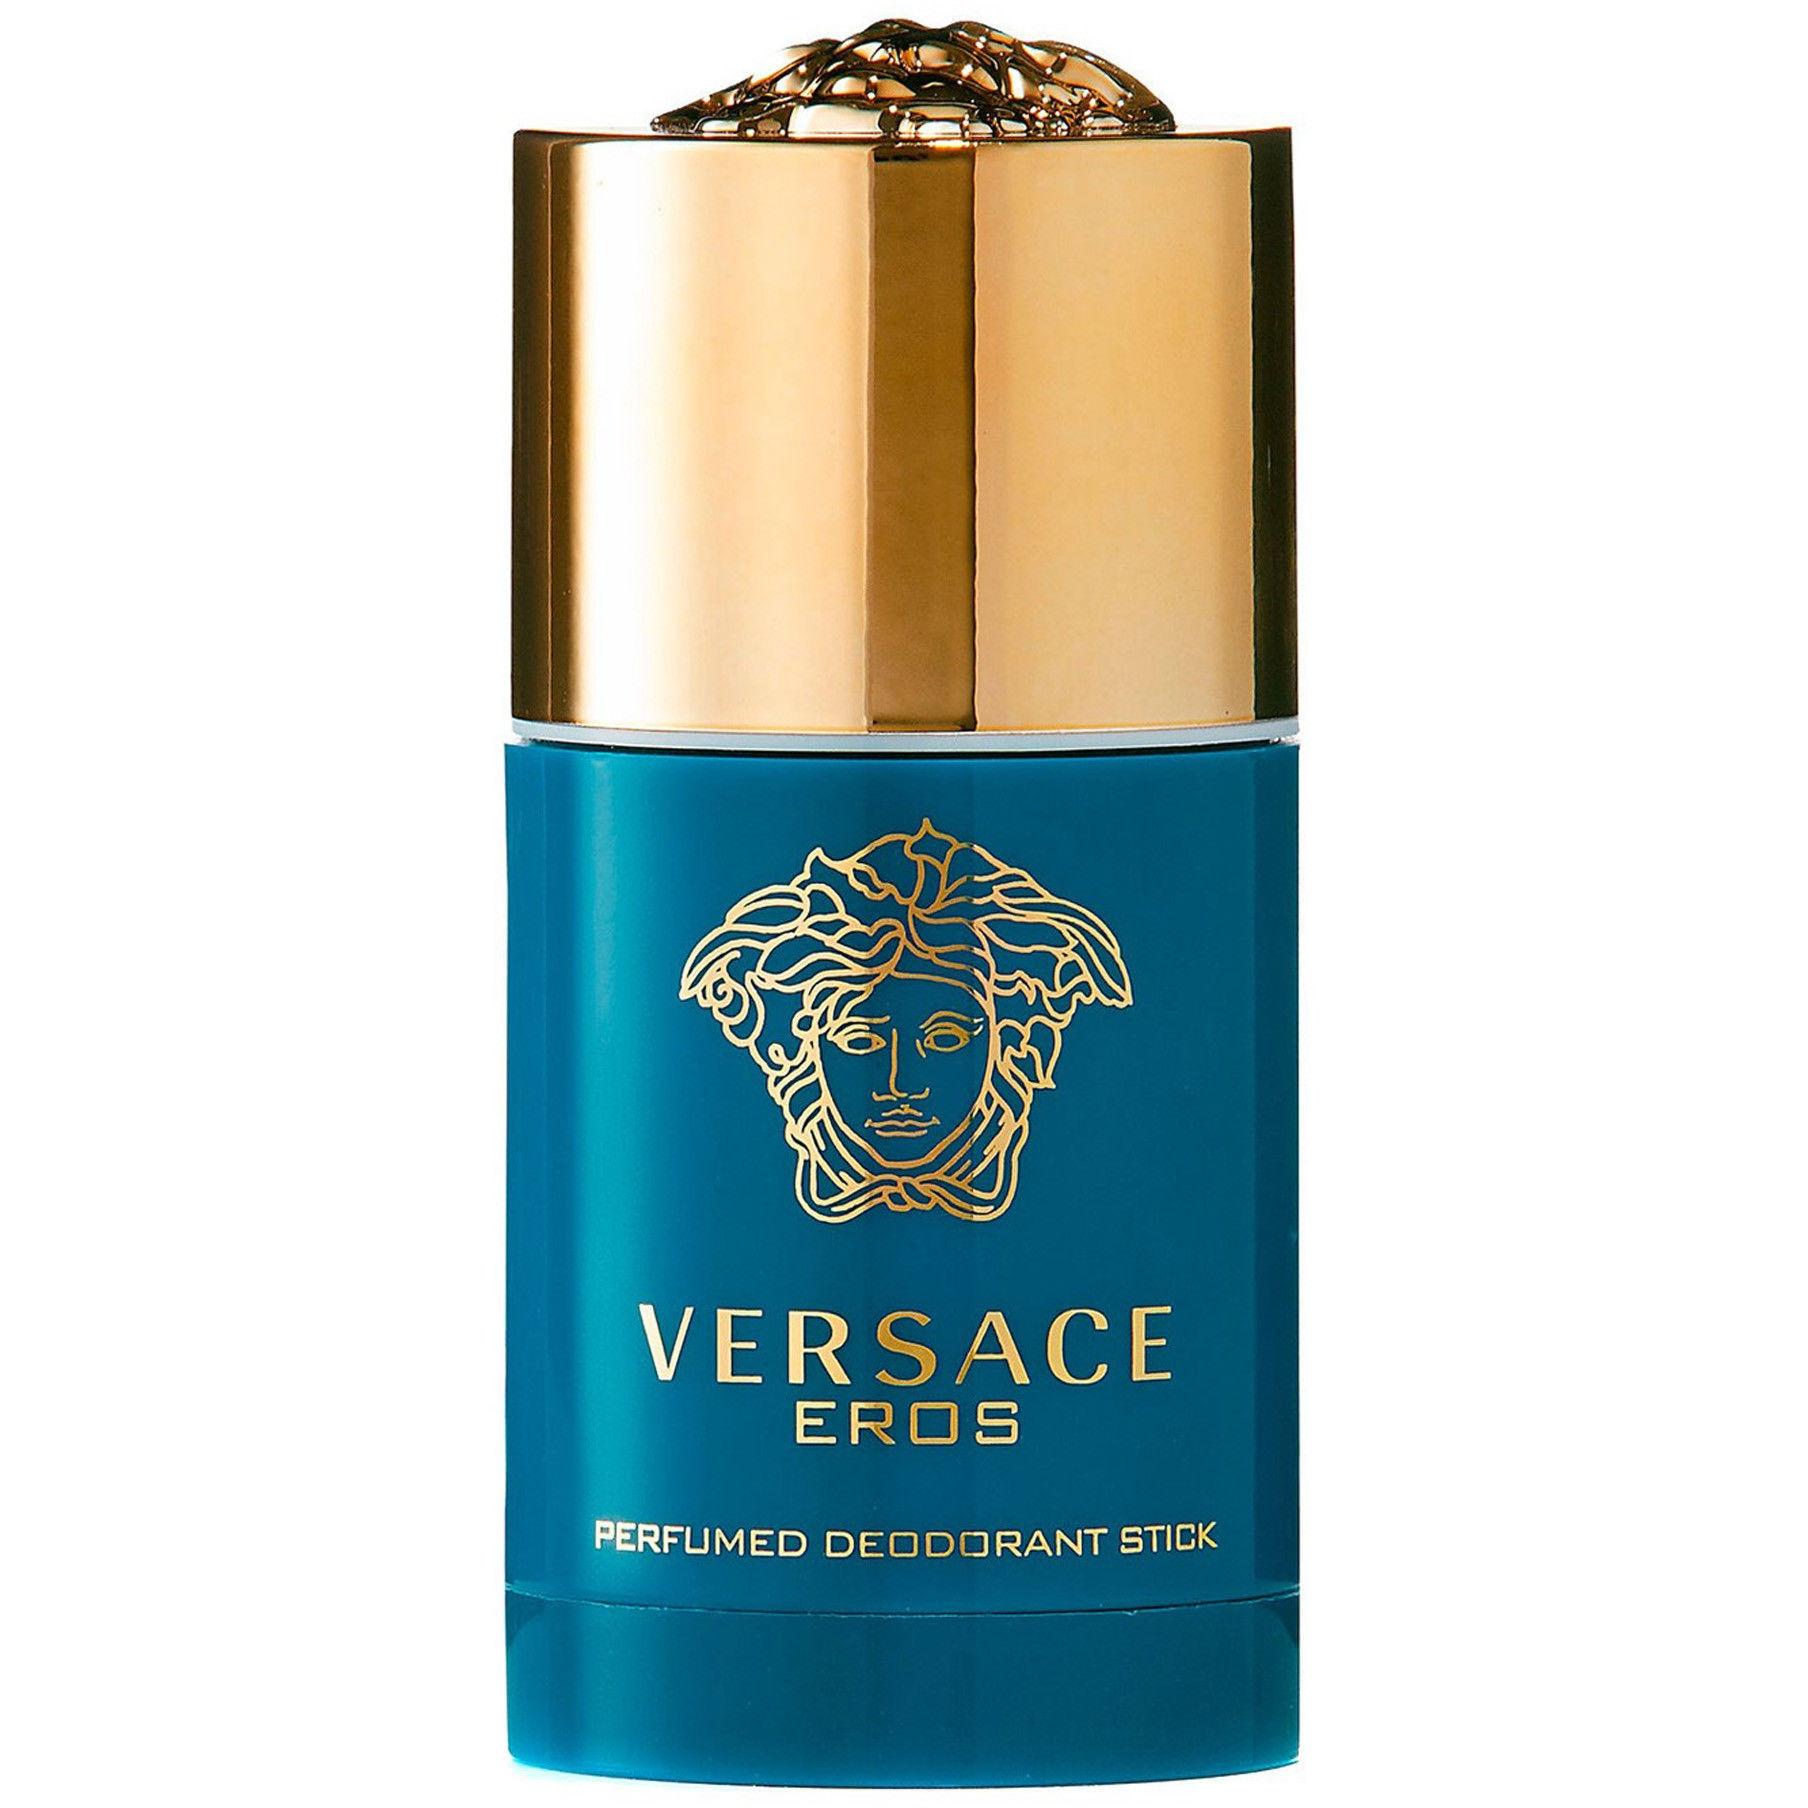 Dezodorant Versace